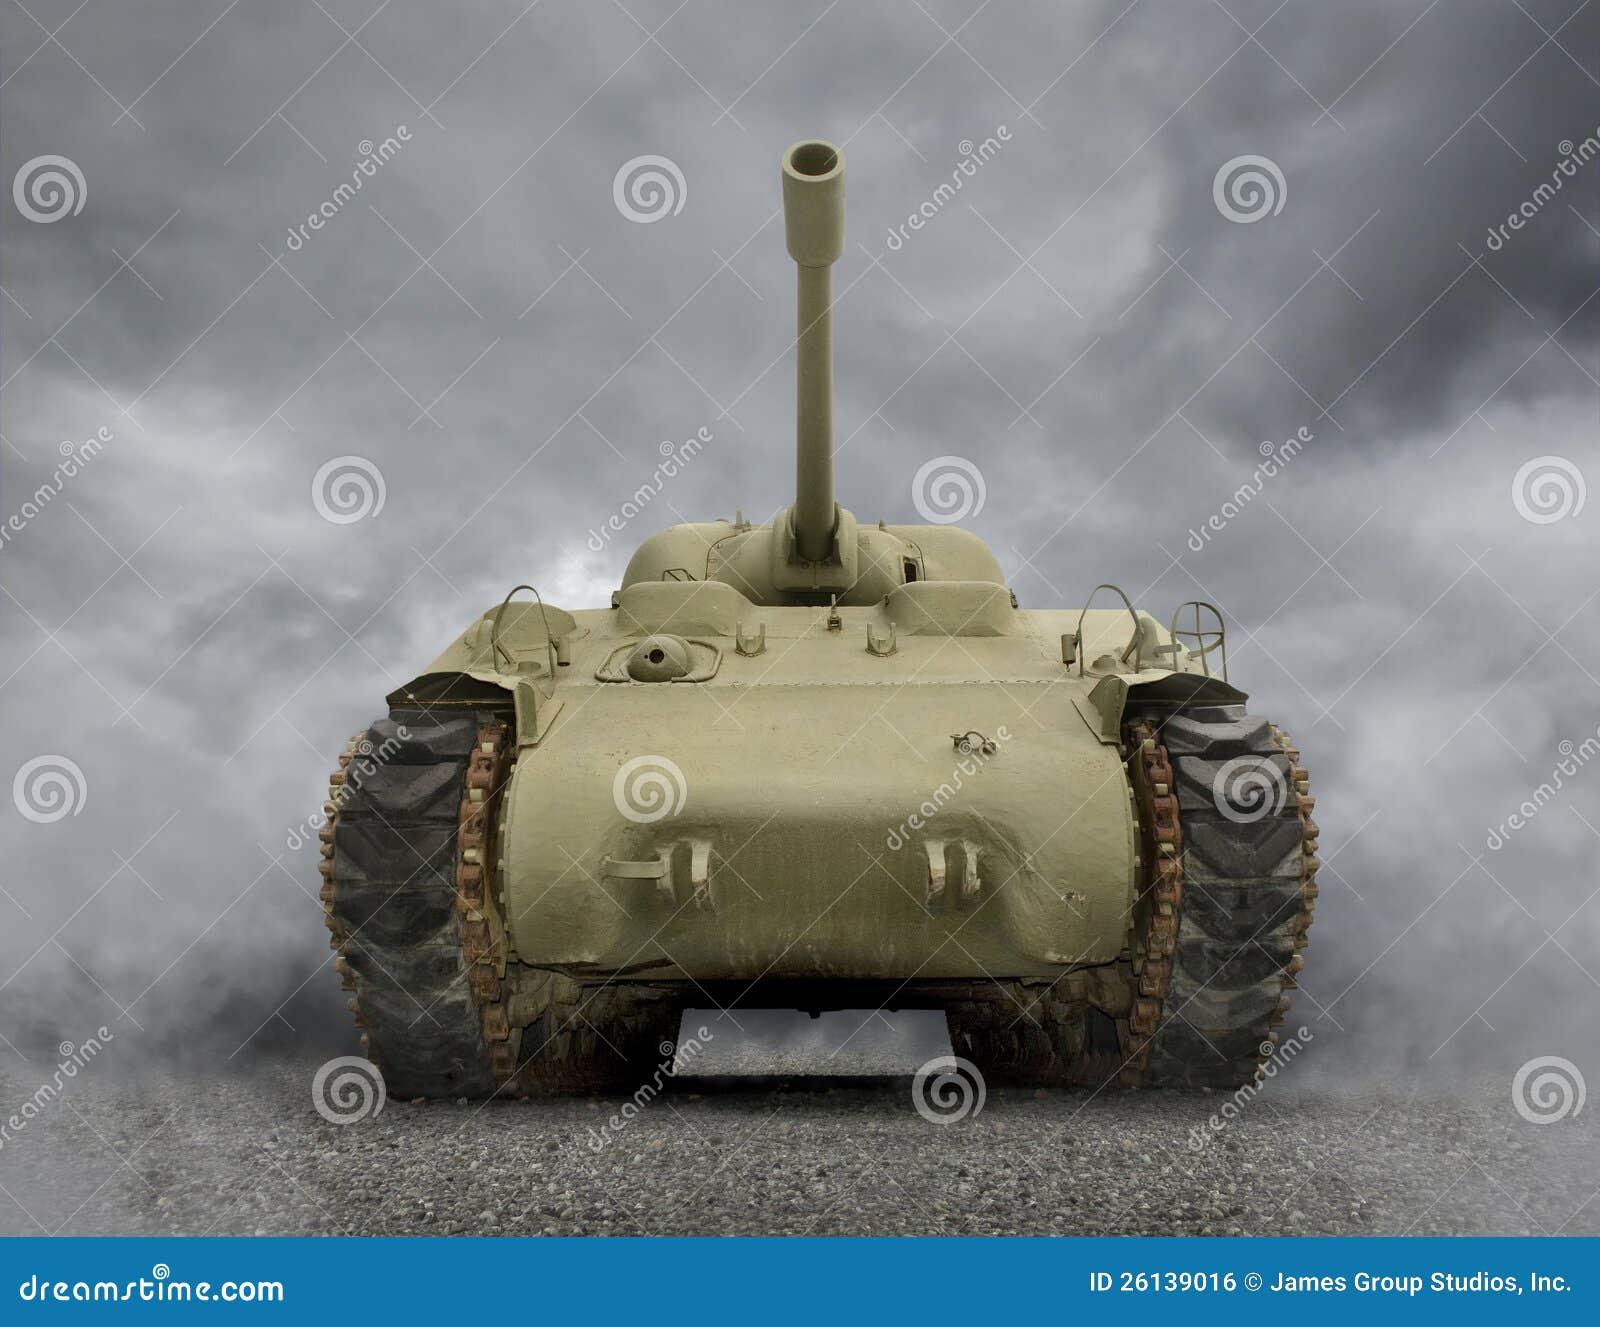 Download General Sherman Tank stock photo. Image of artillery - 26139016